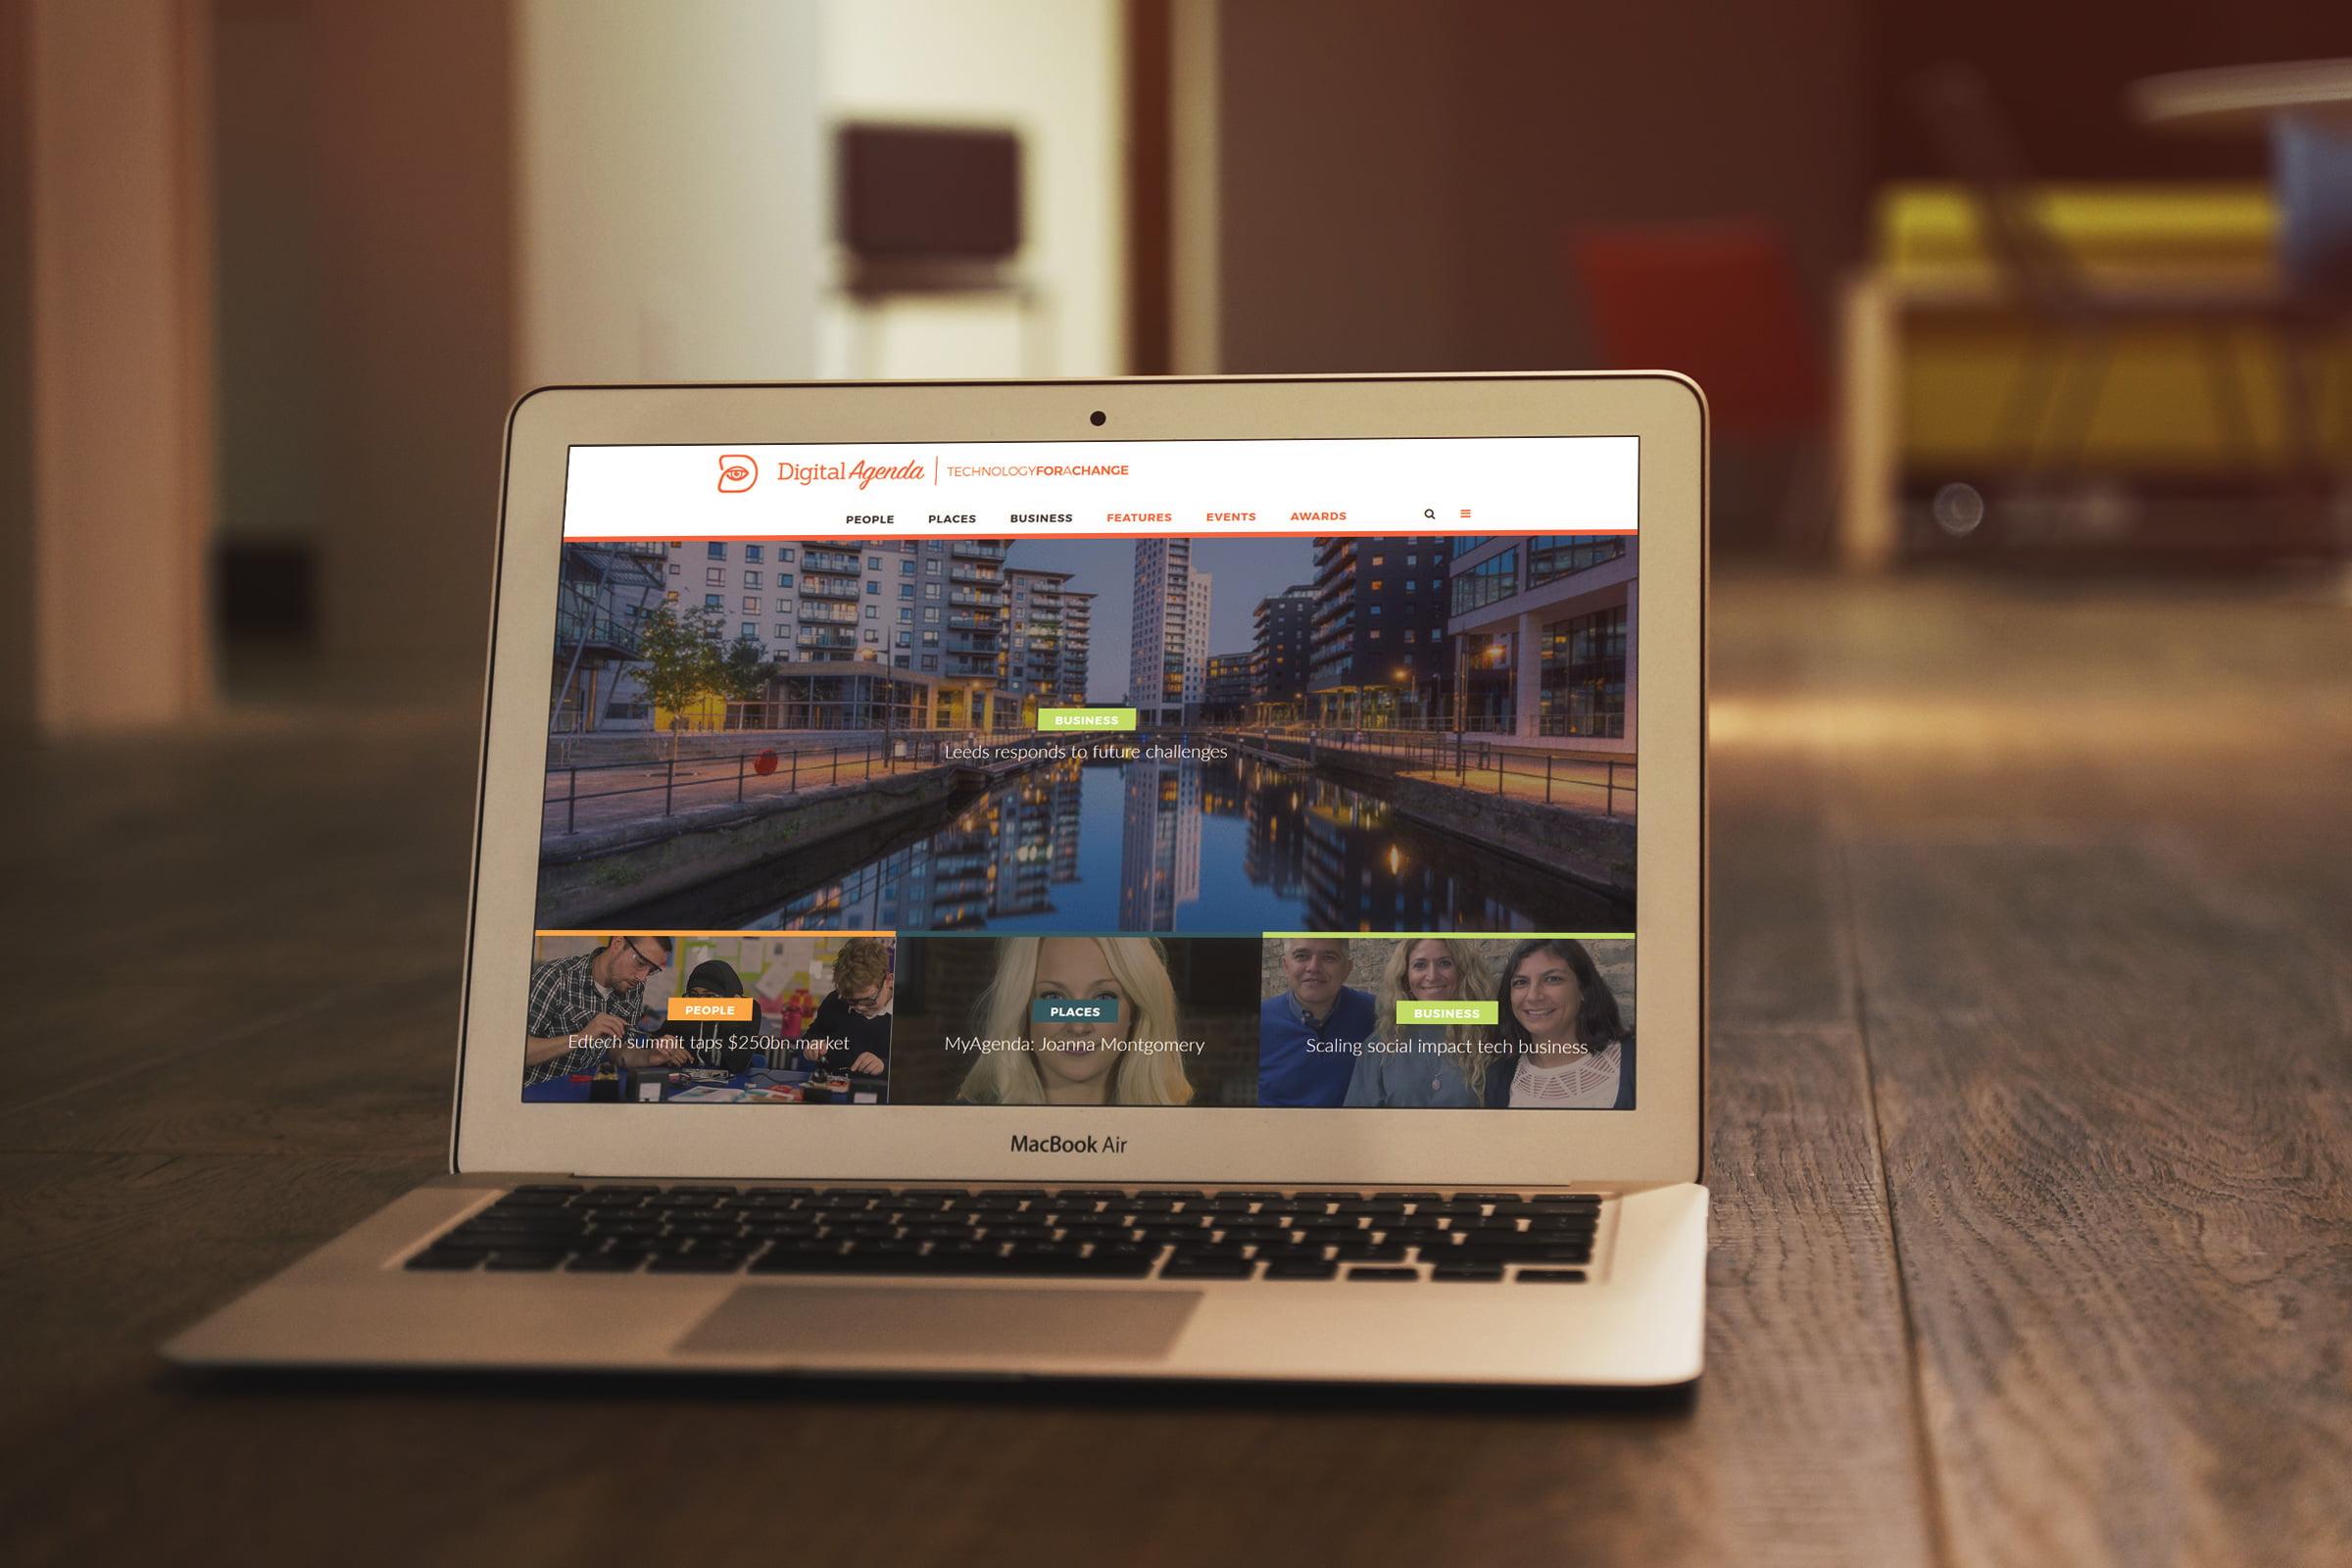 Digital Agenda website displayed on laptop